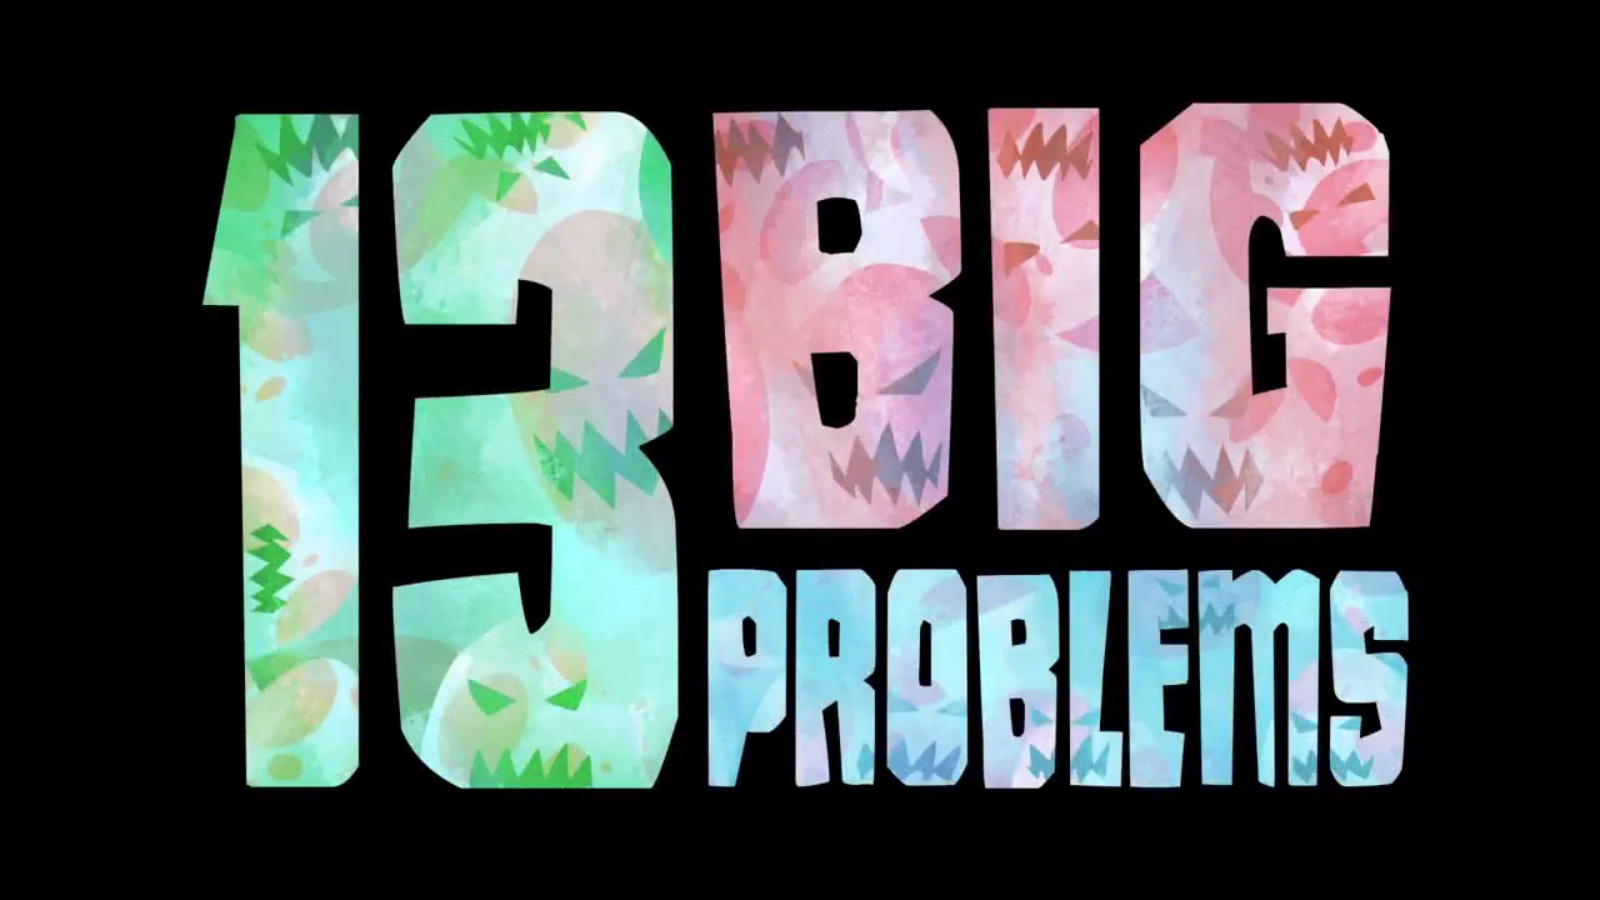 13 Big Problems